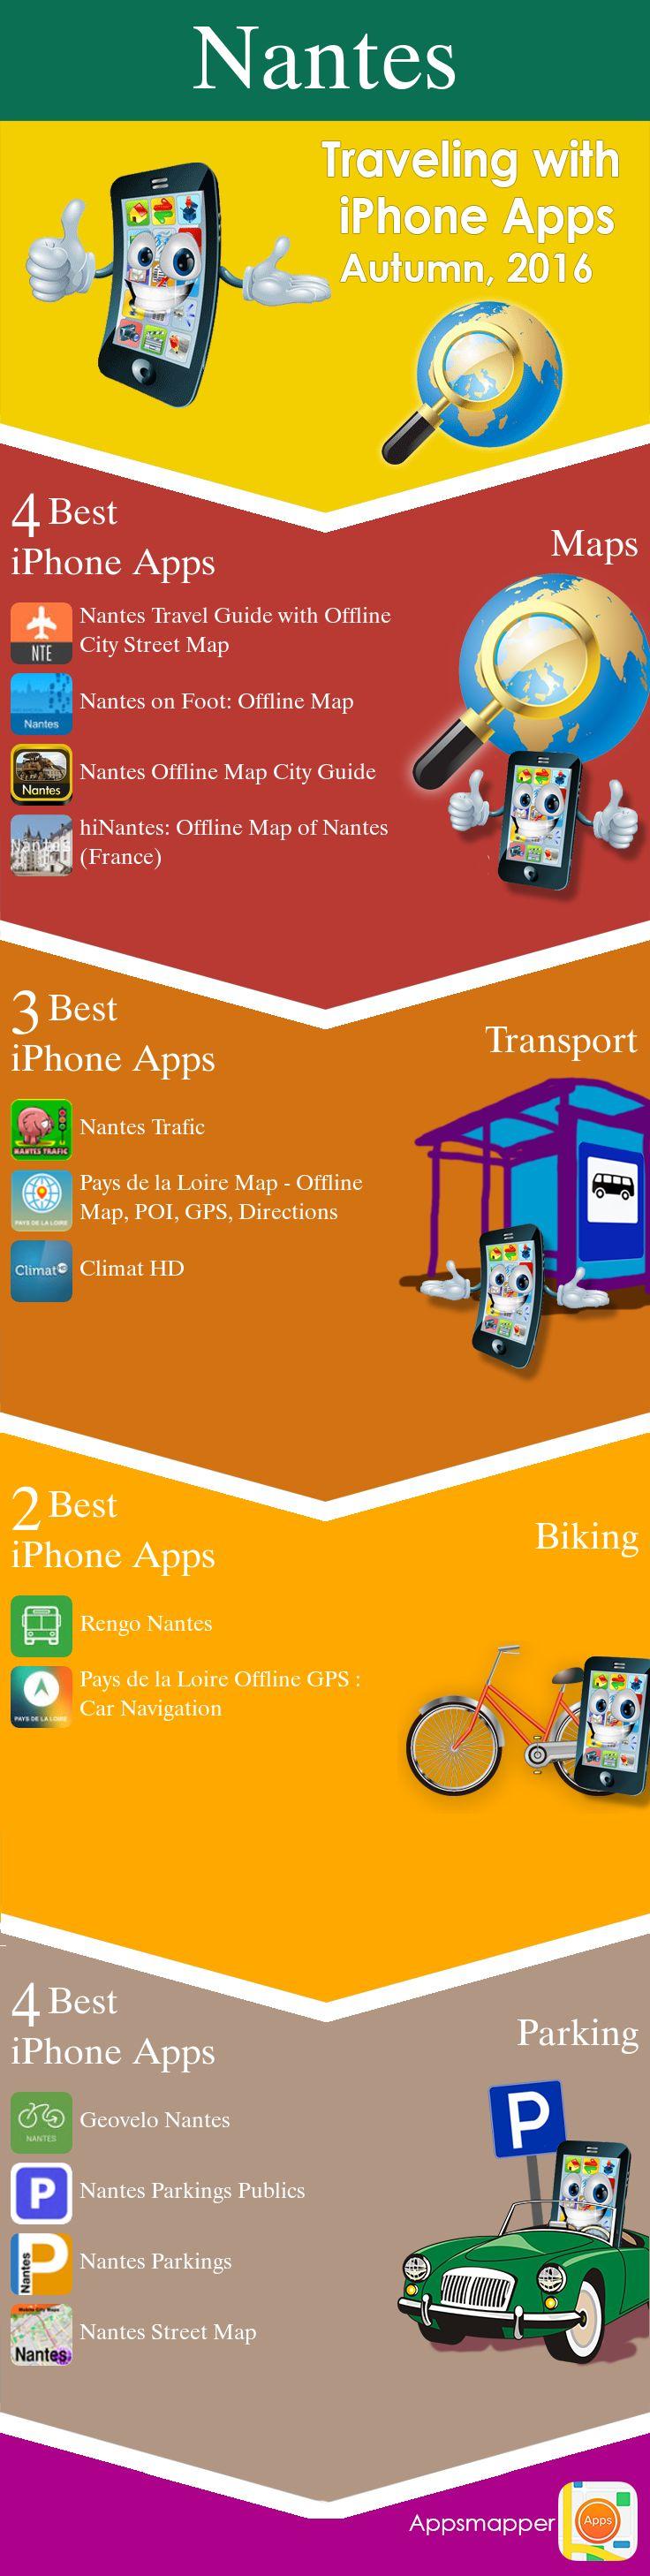 Art color nantes horaires - Nantes Iphone Apps Travel Guides Maps Transportation Biking Museums Parking